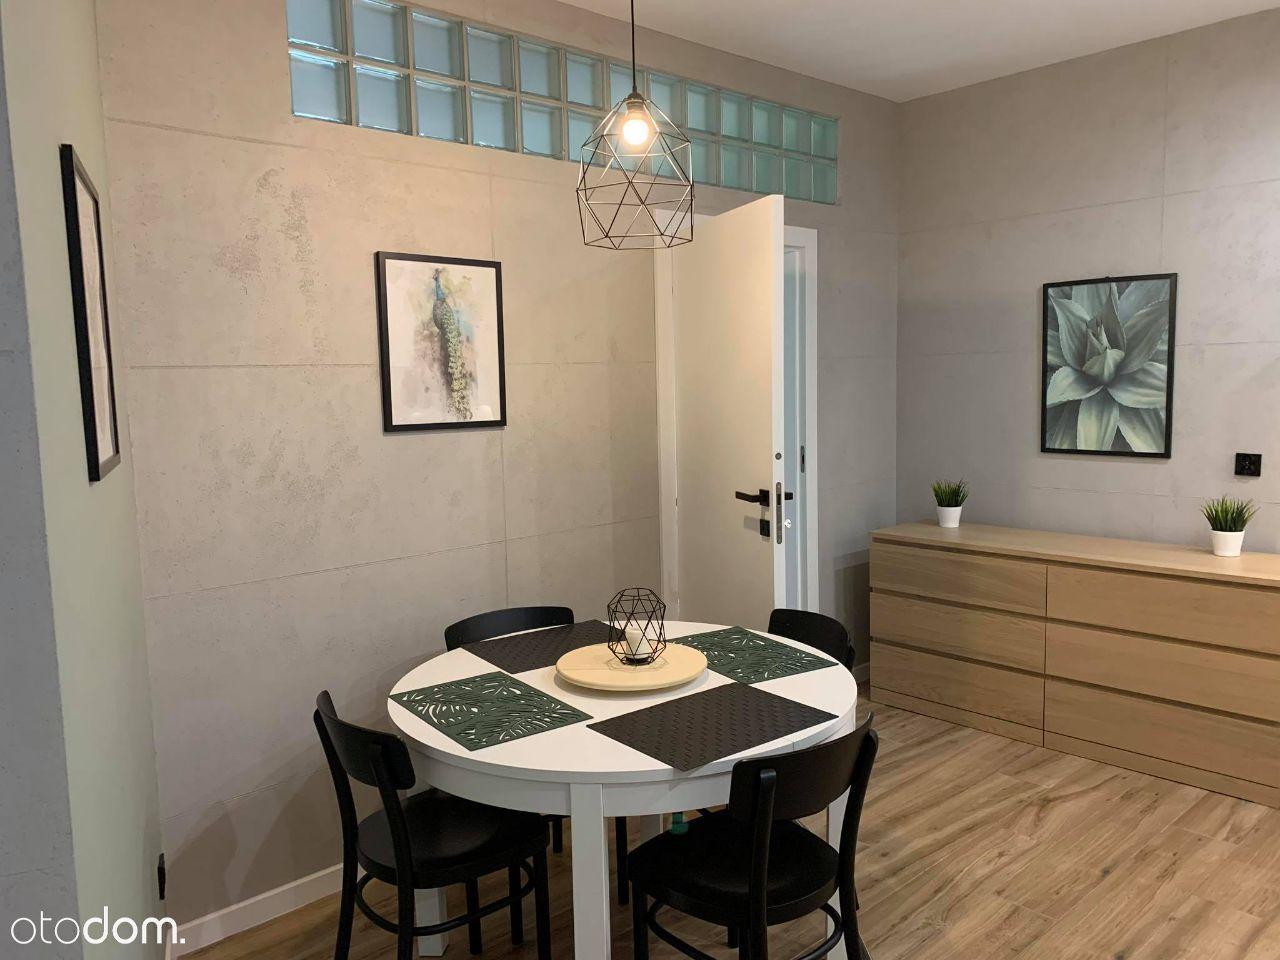 Pokój w nowym mieszkaniu Atal Residence, Zabłocie